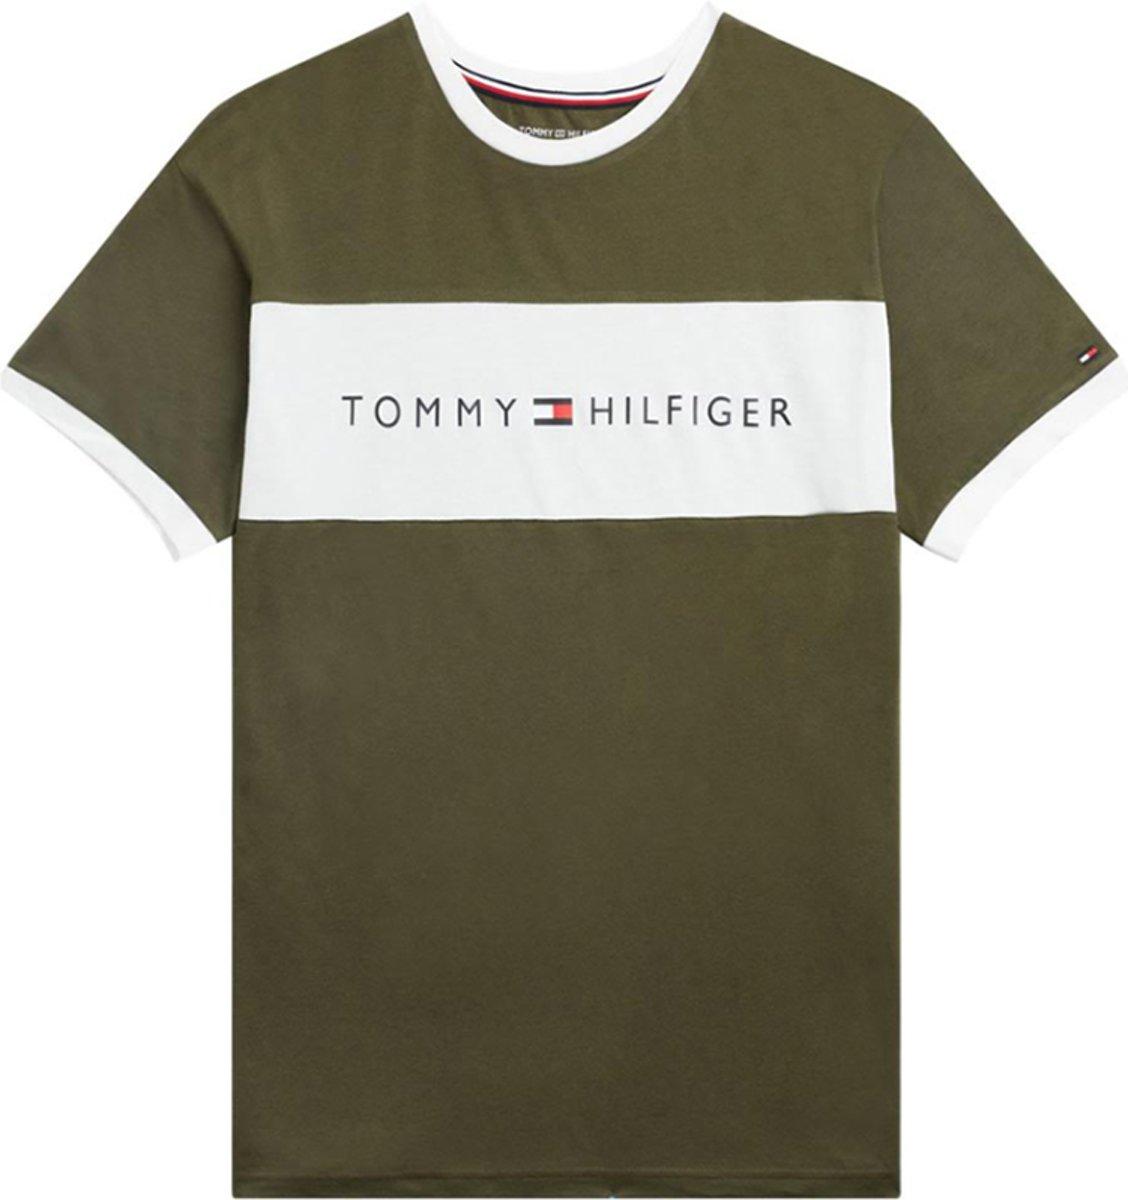 Tommy Hilfiger Heren Ronde Hals Logo Flag T Shirt Groen M